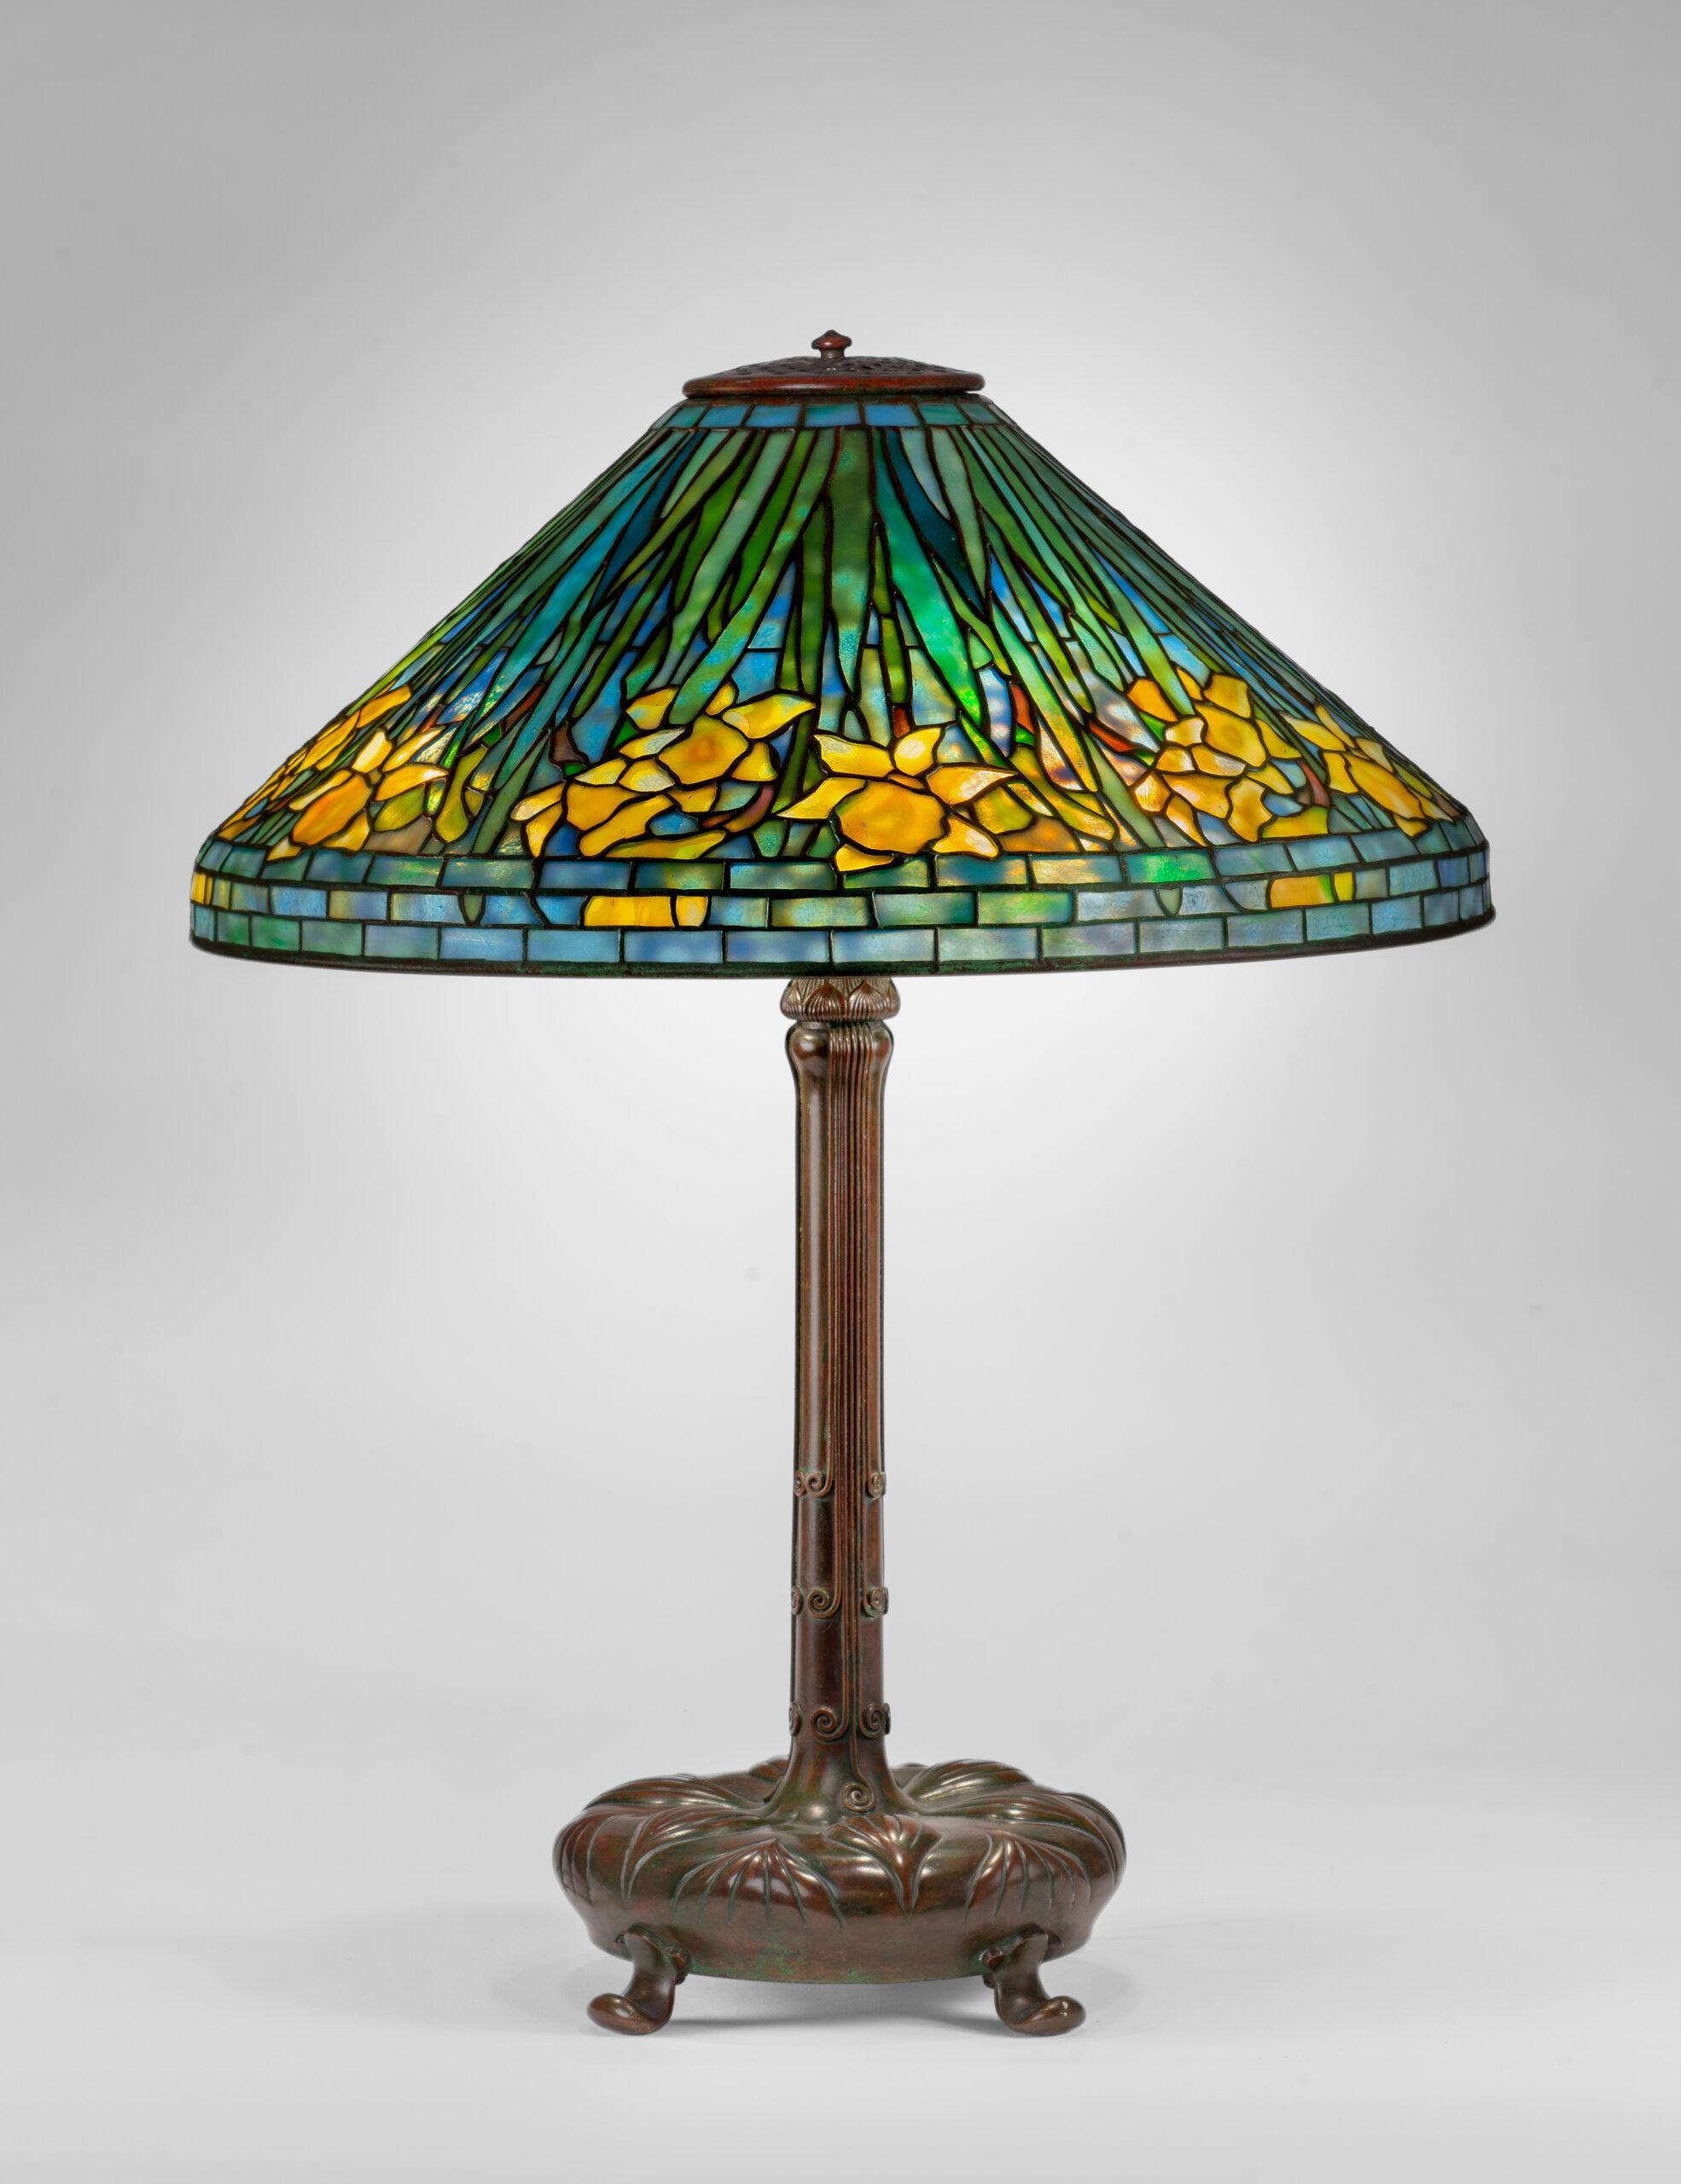 Spotlight on a Tiffany Lamp